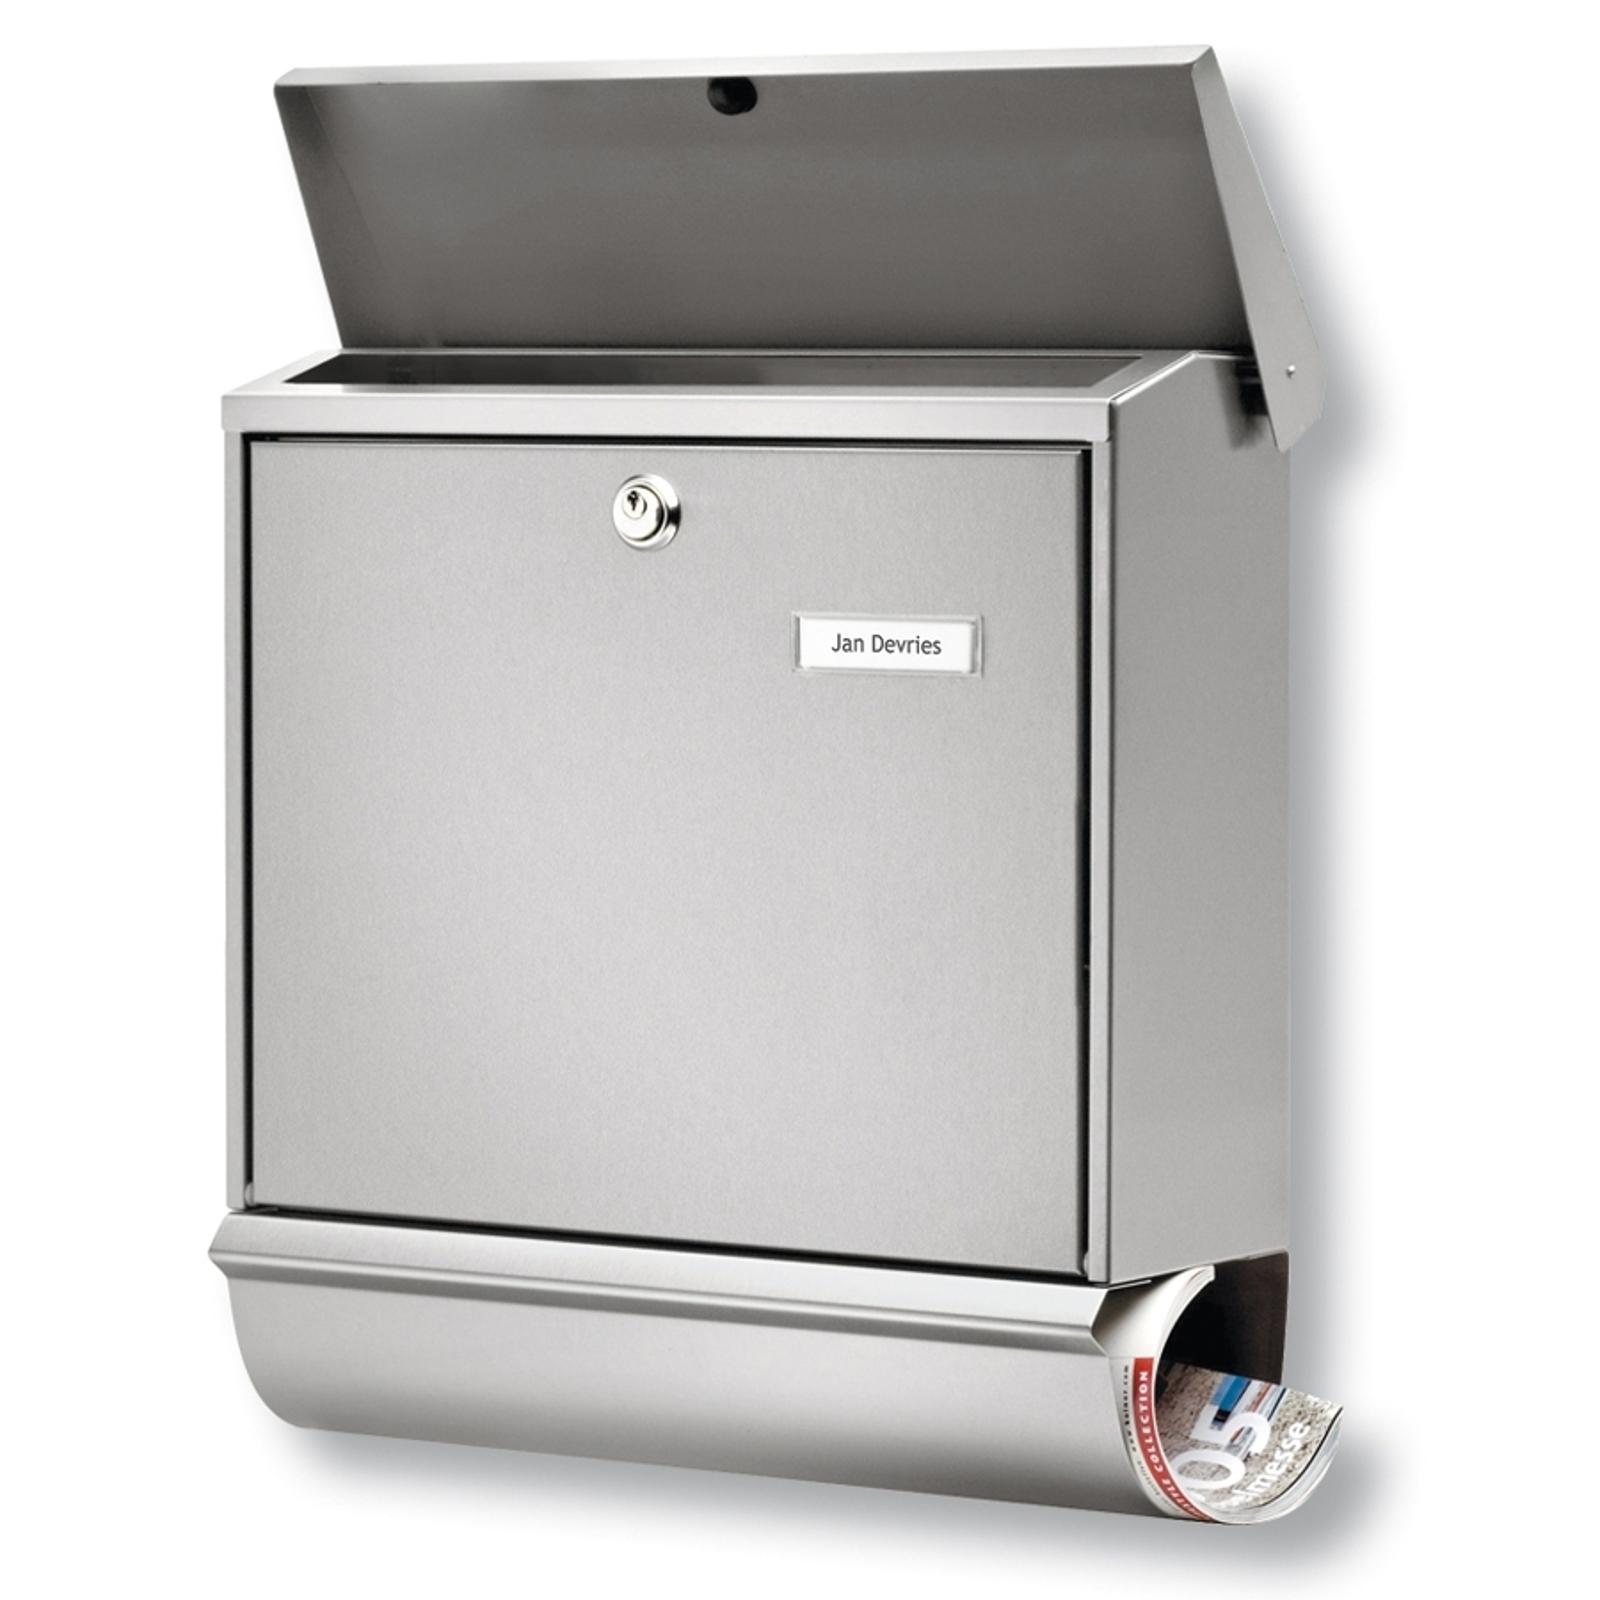 Comfort stainless steel letter box set_1532032_1